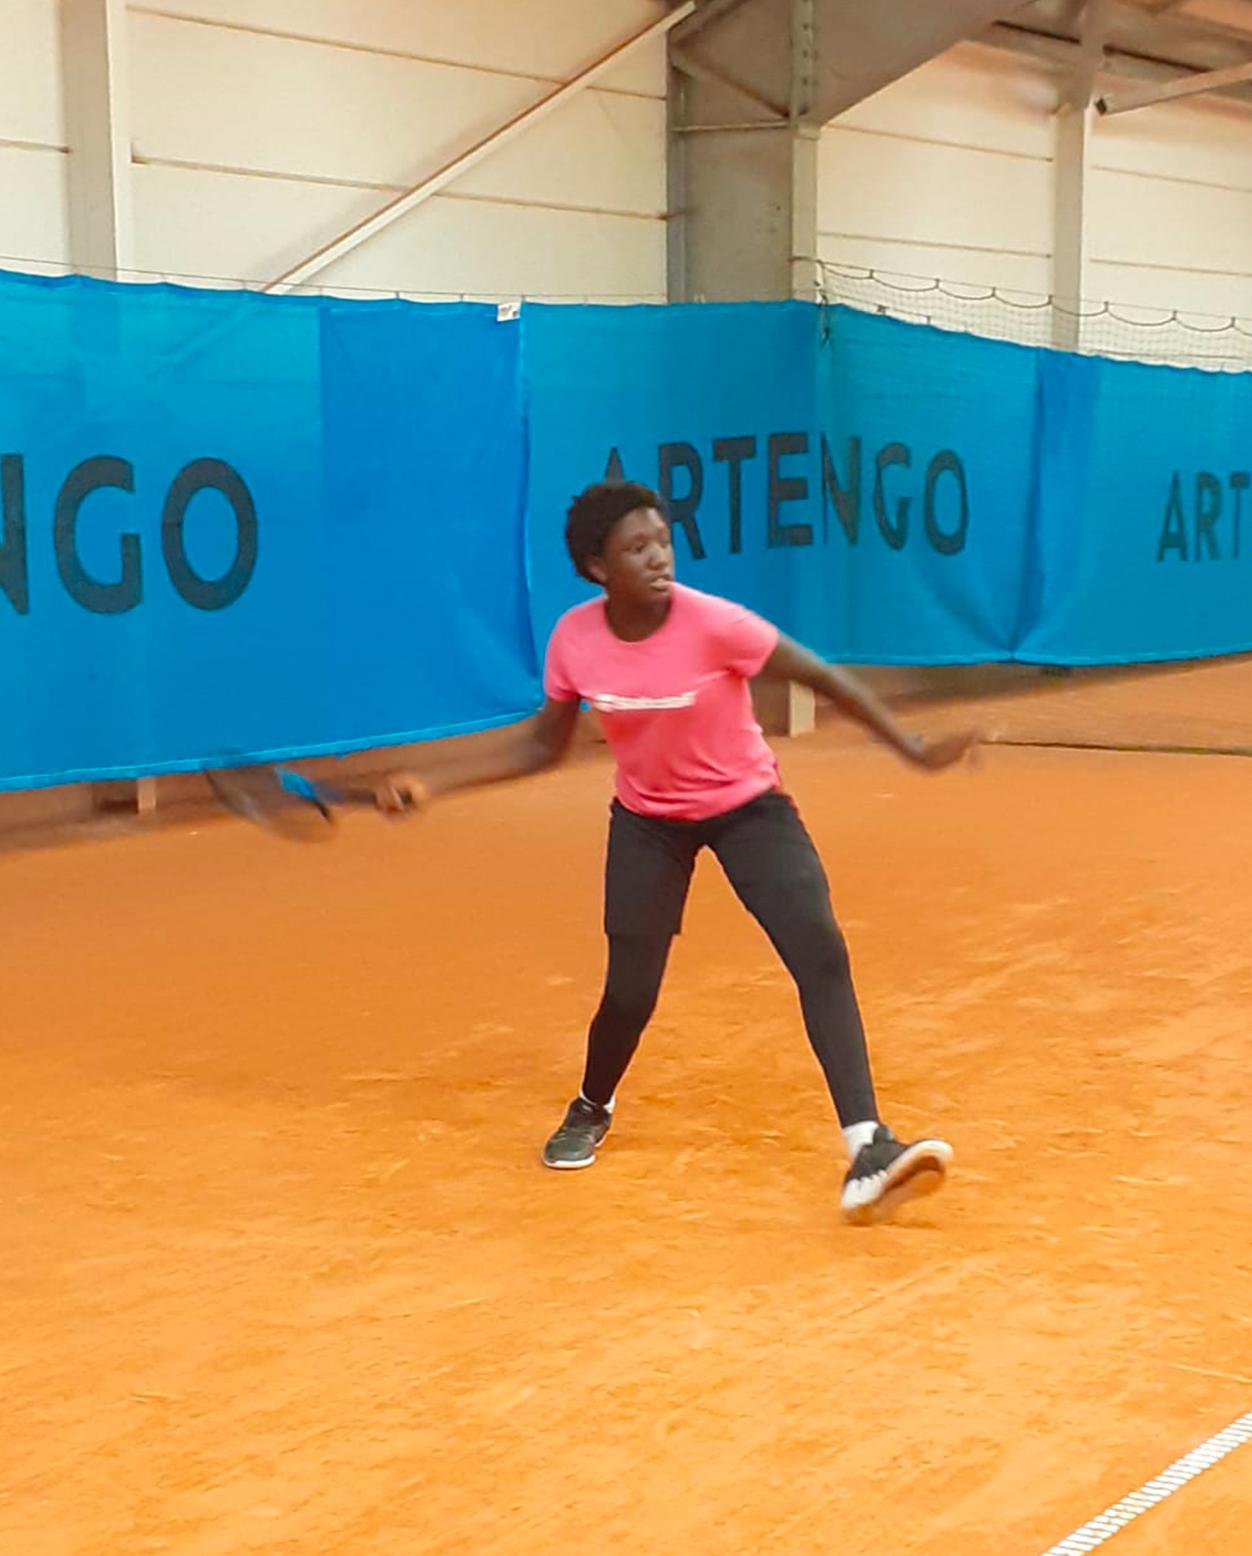 https://www.team-bms-tennis.fr/wp-content/uploads/2020/09/Anny.jpg